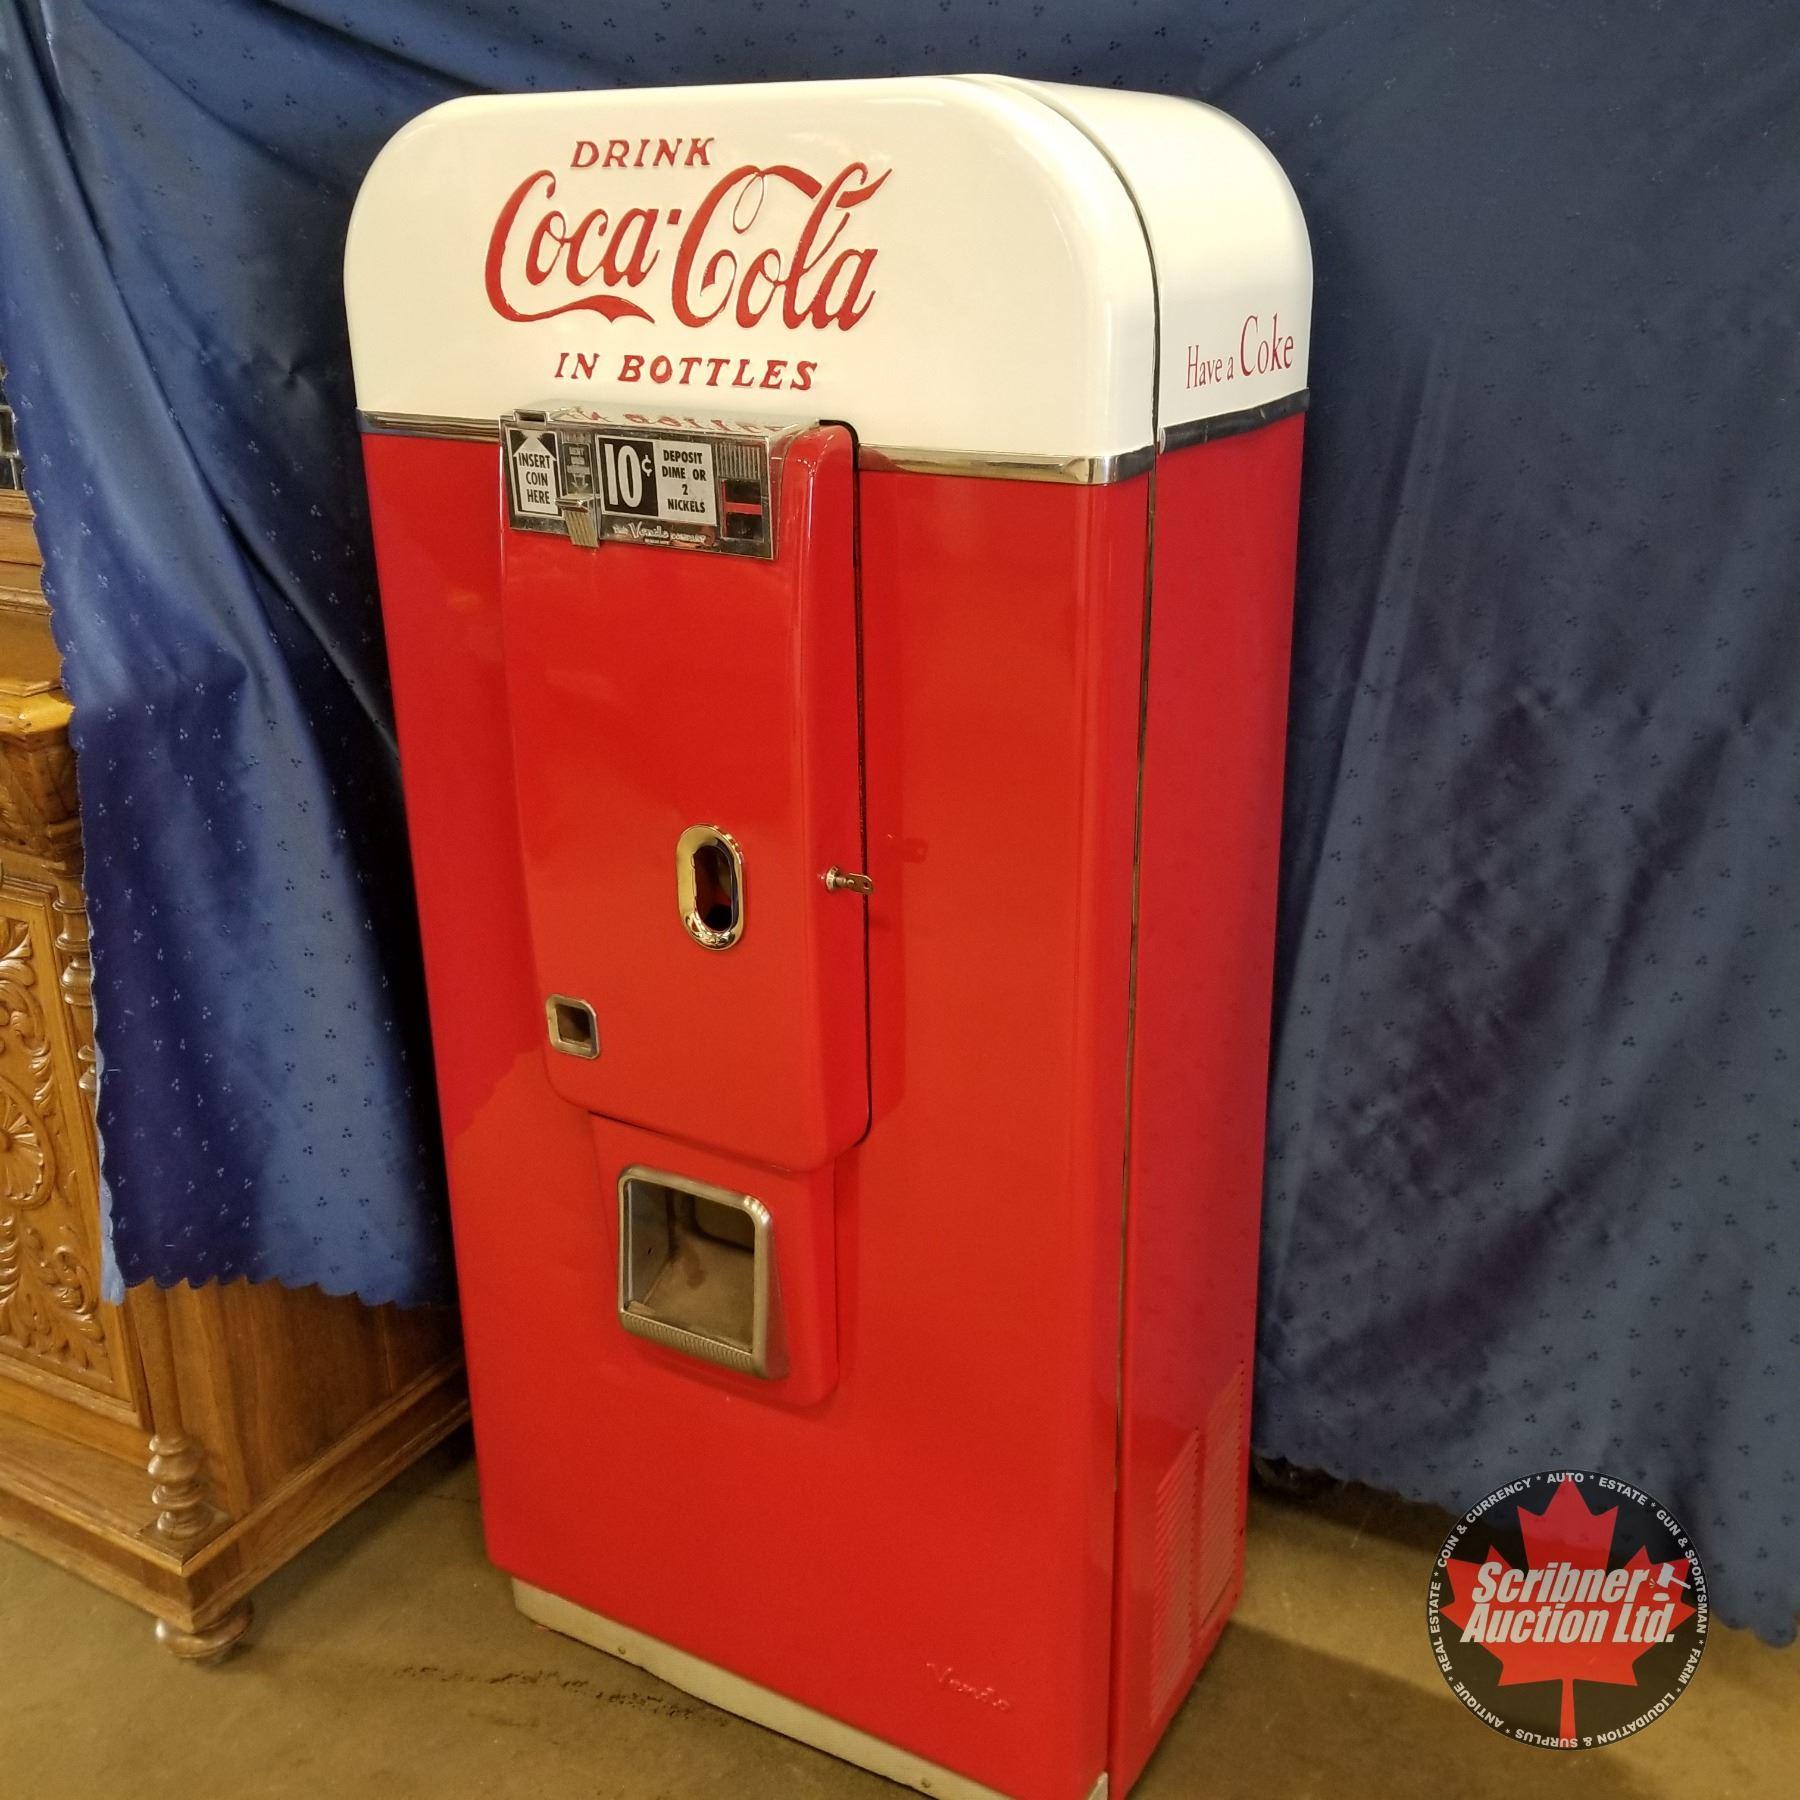 Free Bonus! Working Details about  /Coke Coca Cola Vendo 80 V-80 Soda Vending Machine Rare